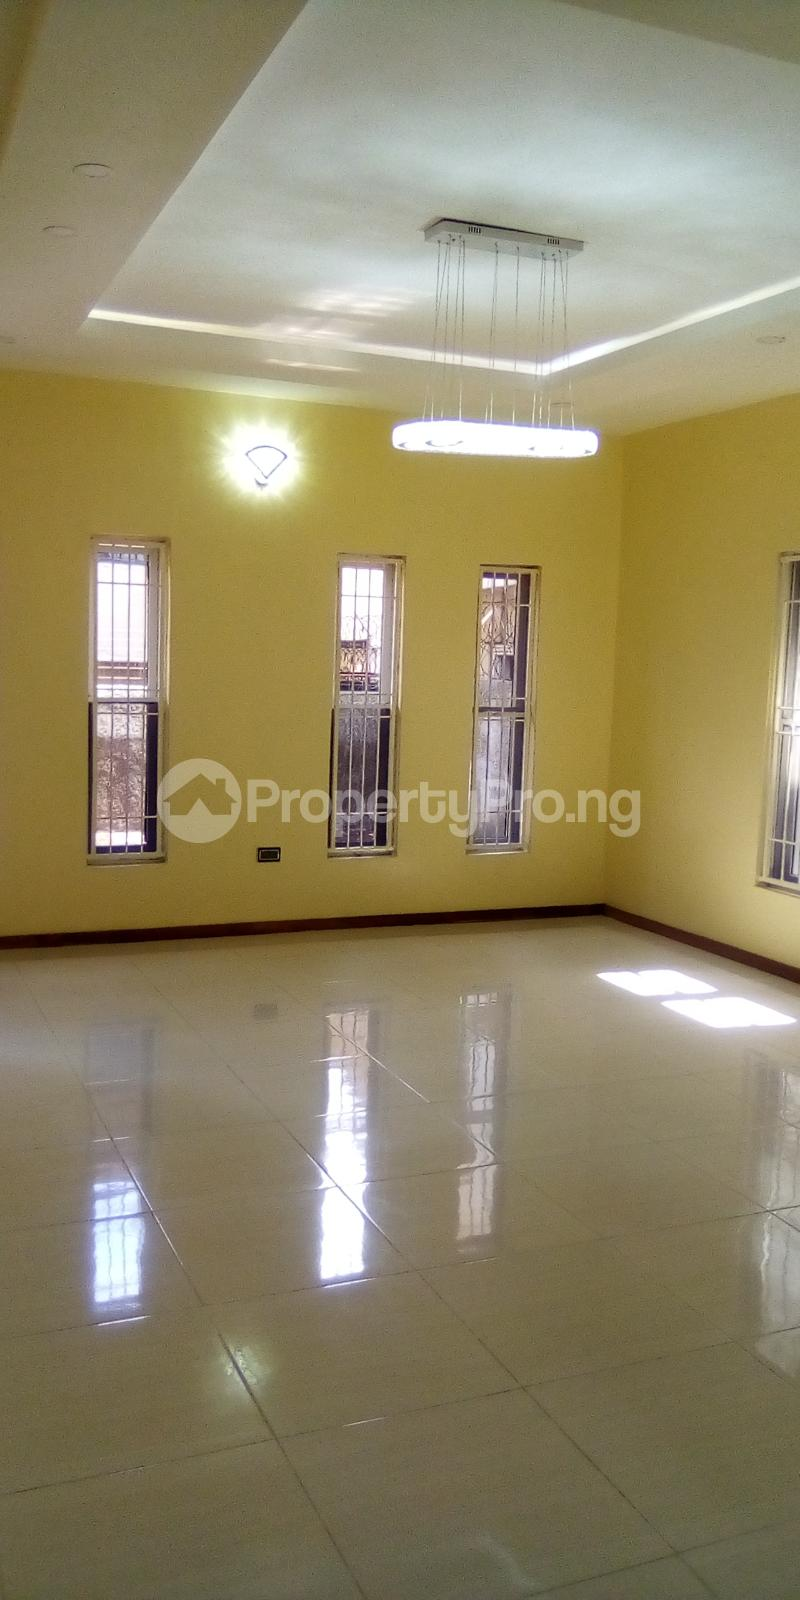 5 bedroom Detached Duplex for sale Southern View Oral Estate Lekki Lagos - 4